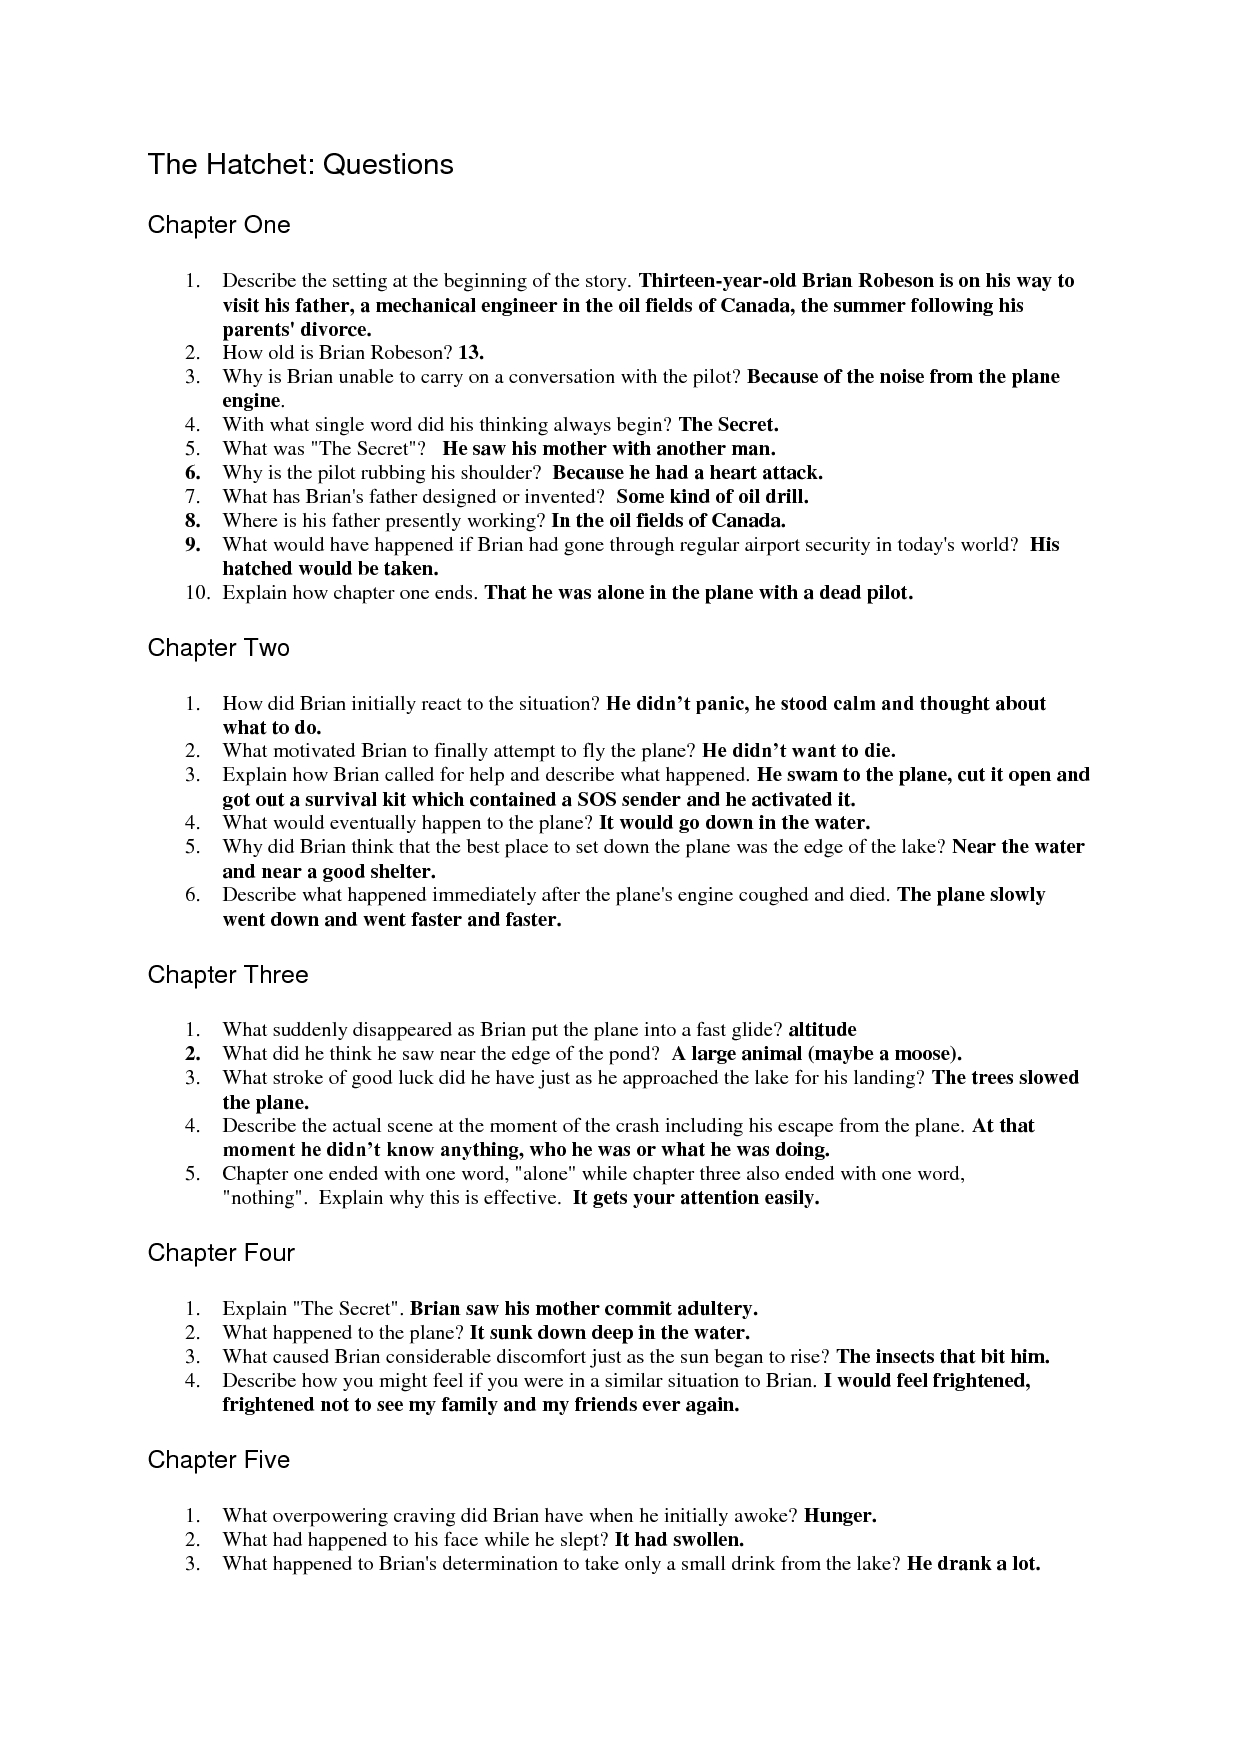 The Hatchet Question Sheet - Answers | Questions | Essay Questions | Hatchet Worksheets Printable